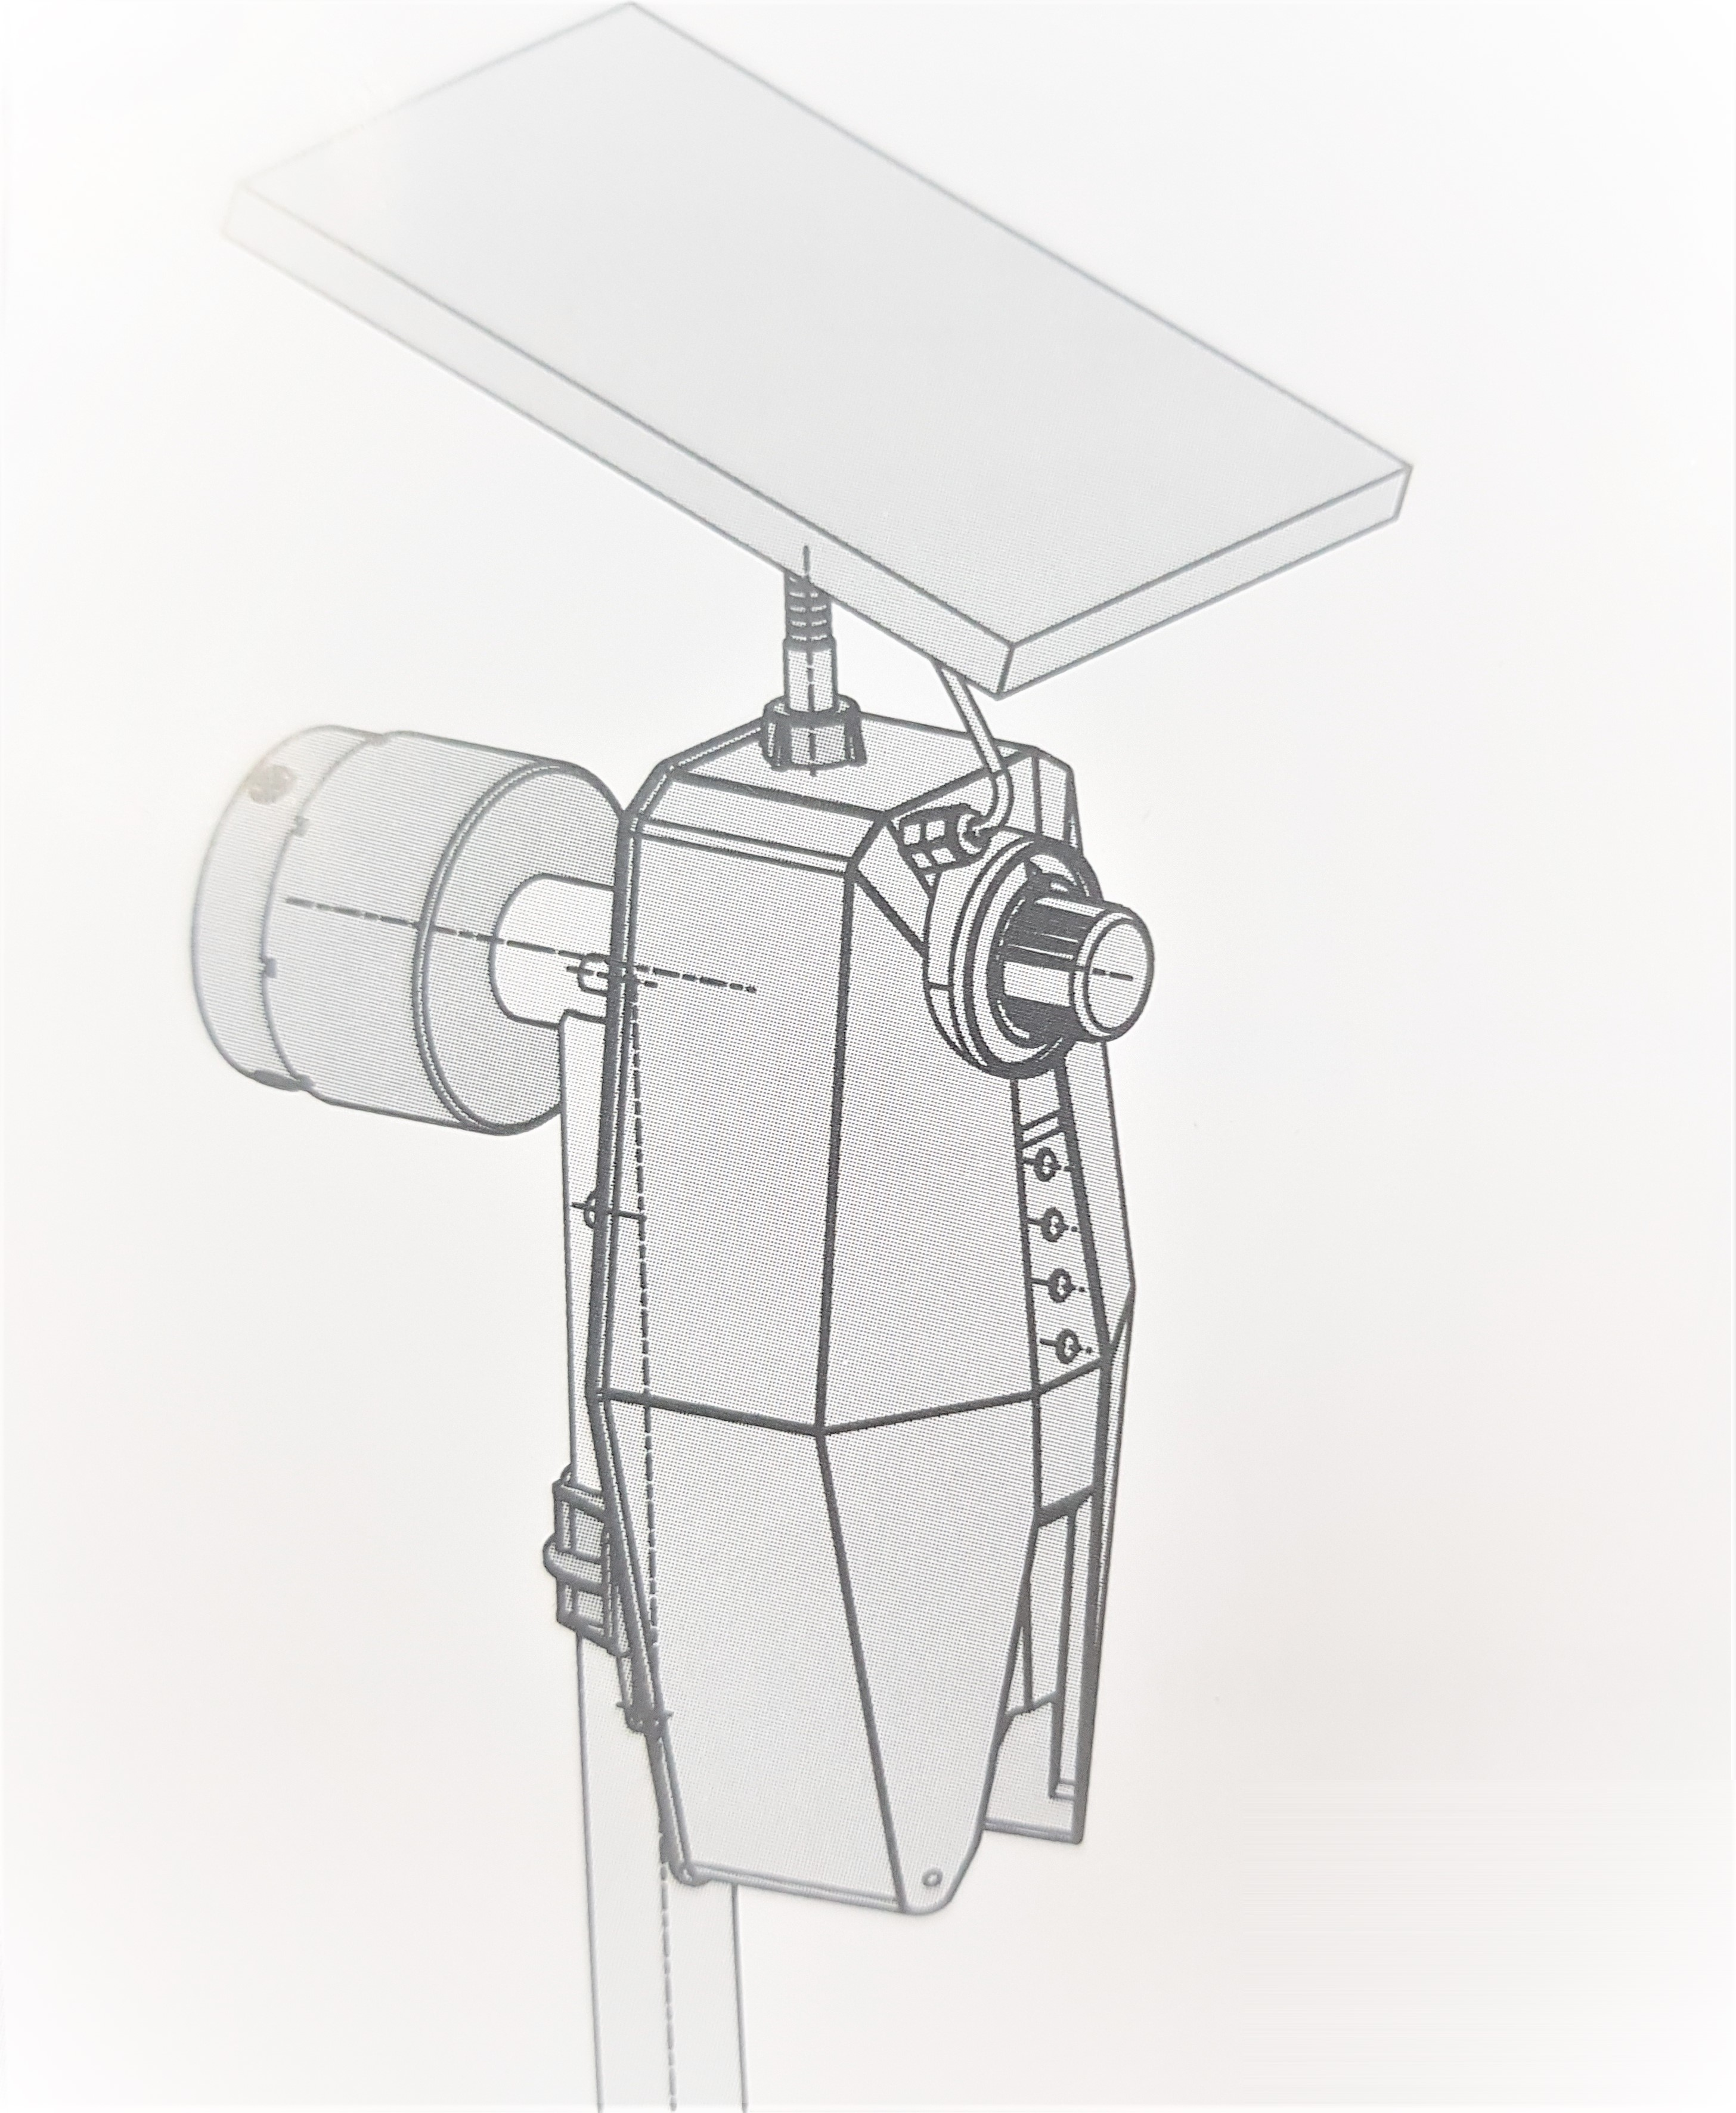 solarni pogon za motalicu